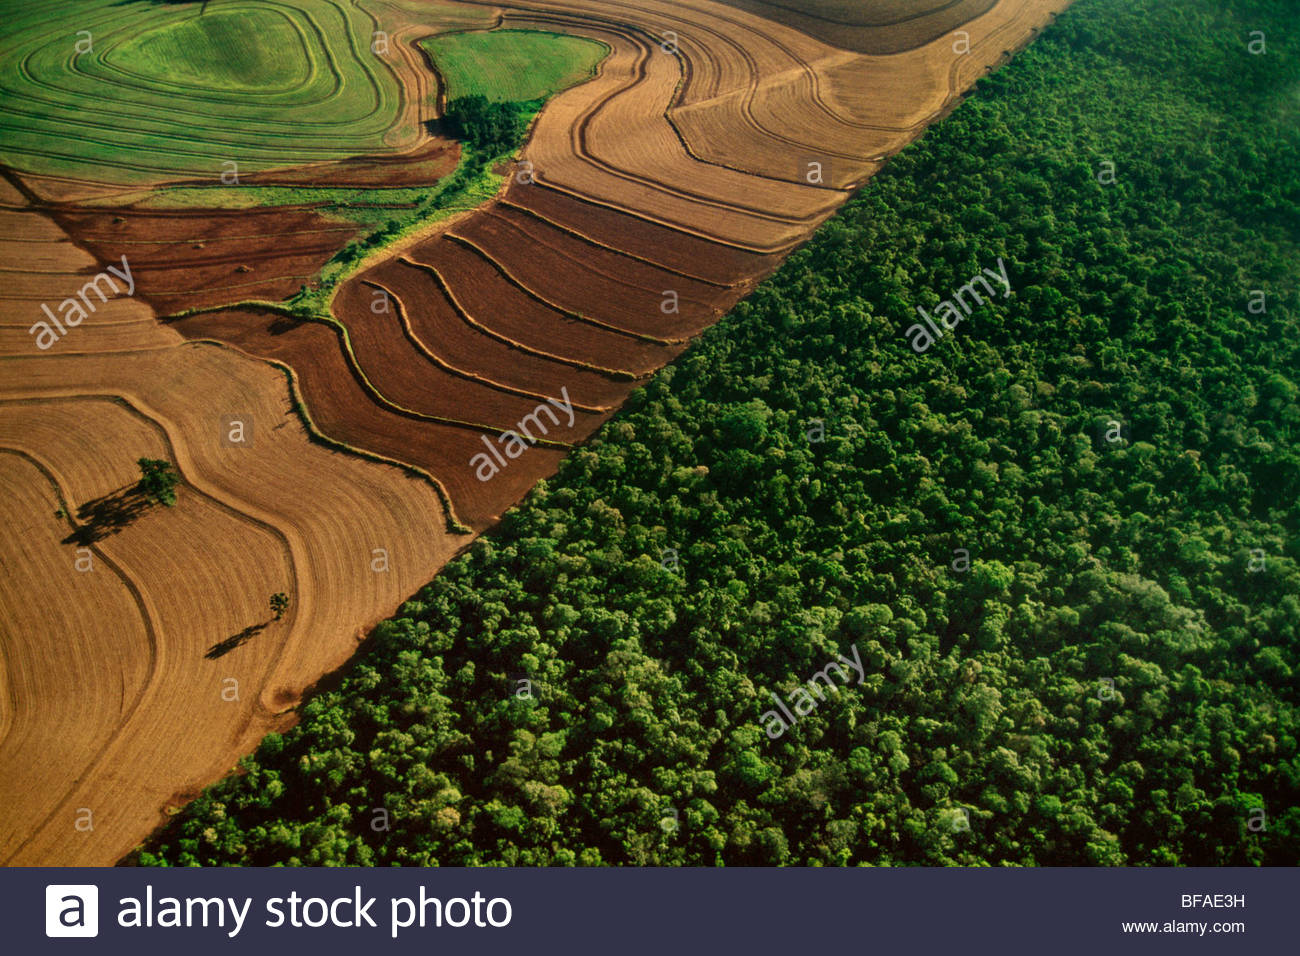 Ackerland grenzt an Lebensraum Regenwald (Antenne), Nationalpark Iguaçu, Brasilien Stockbild